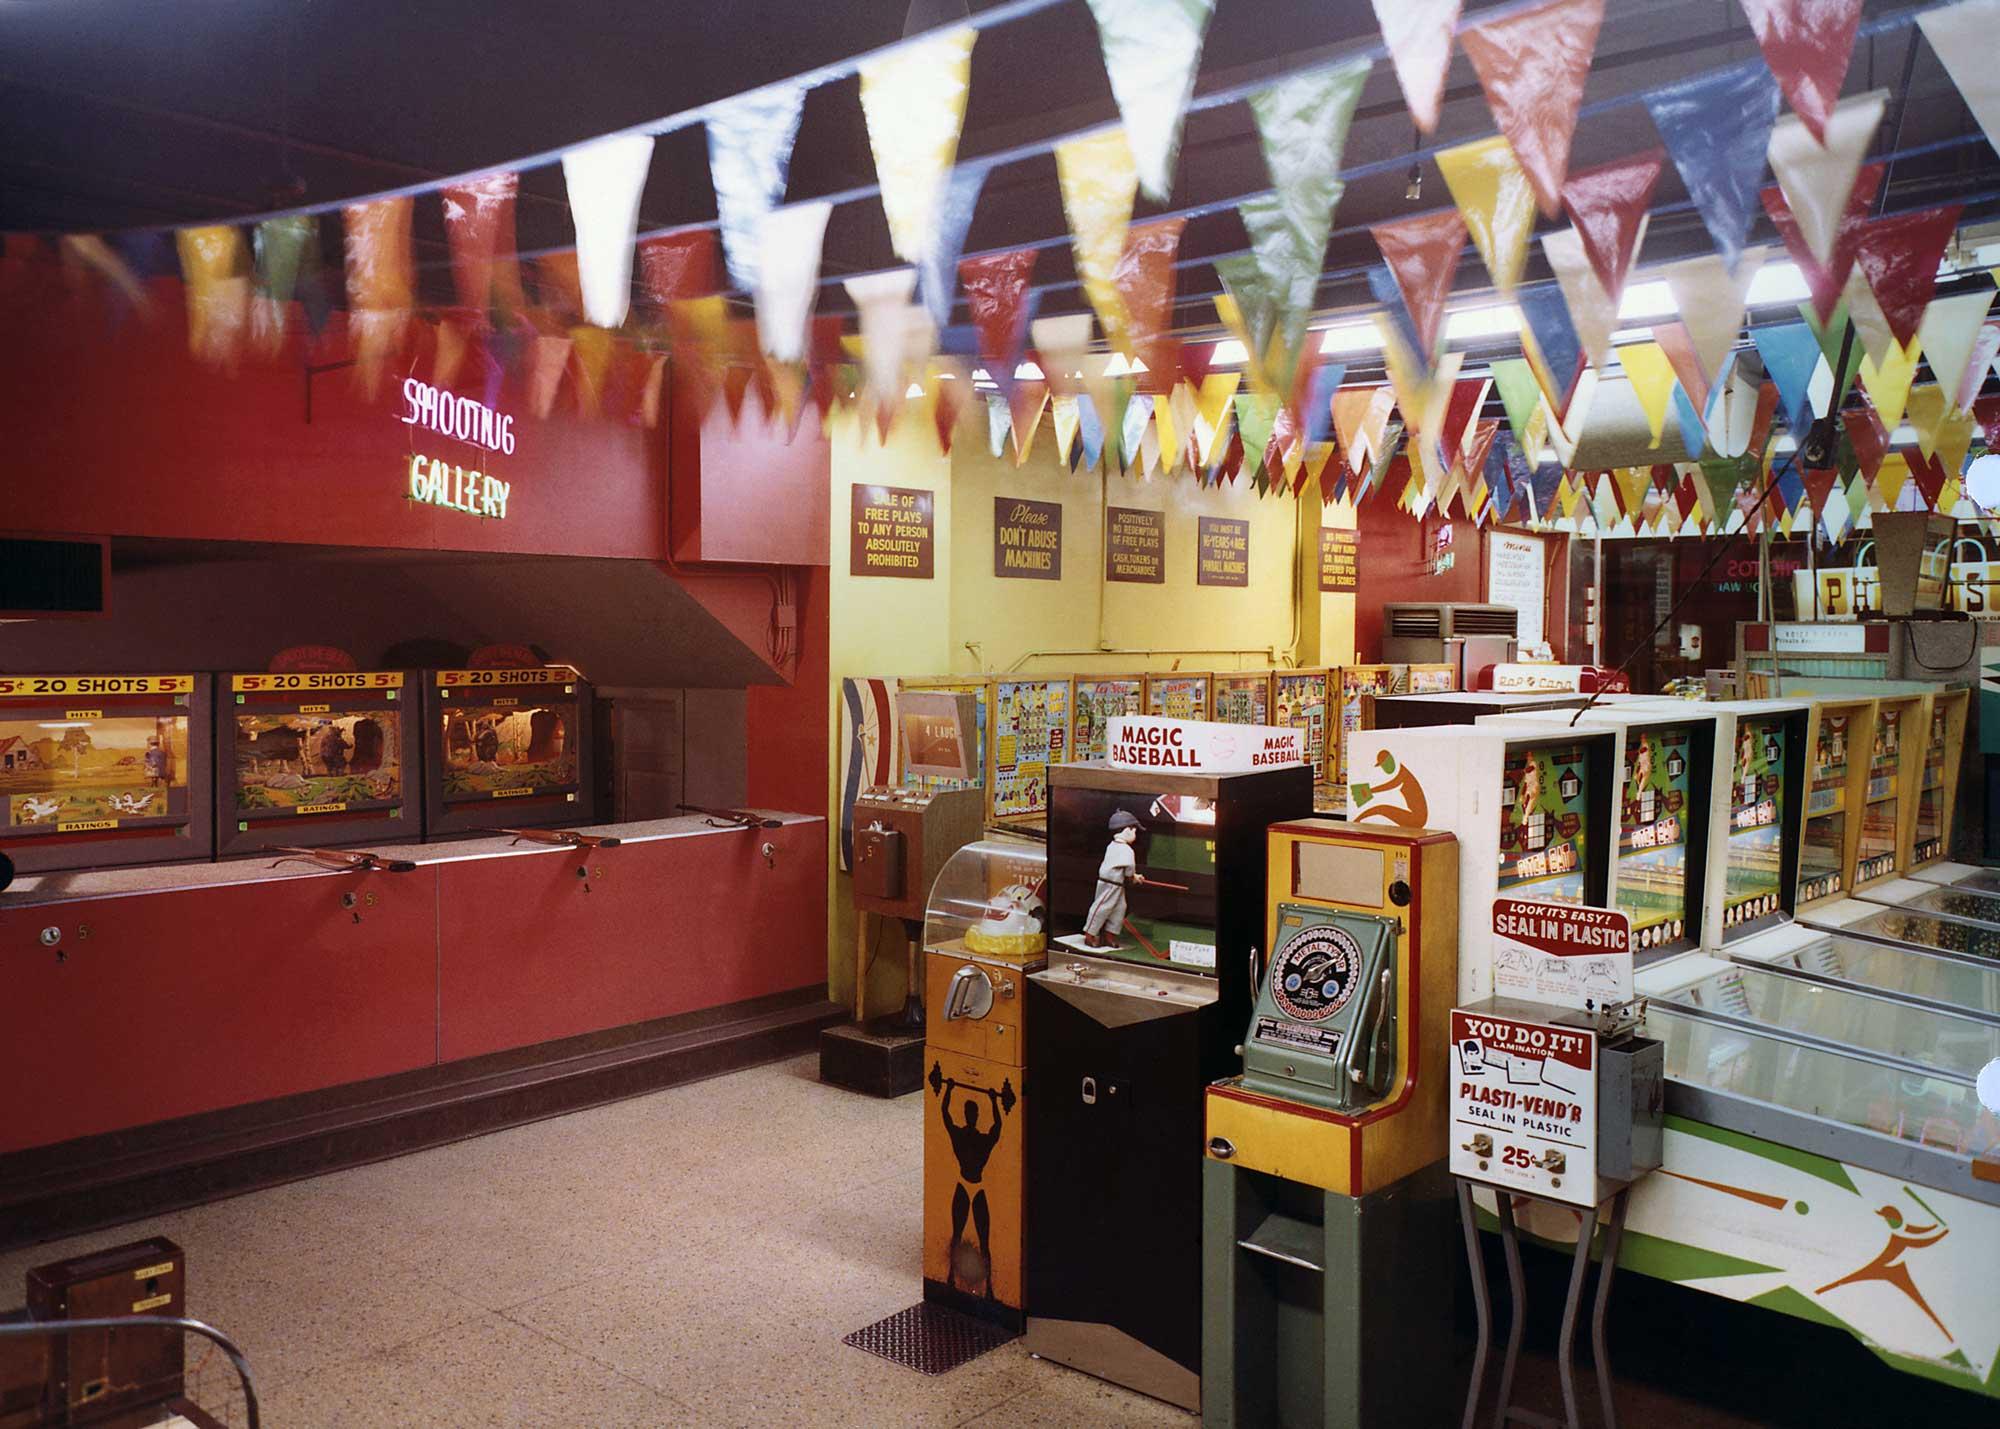 wonderland-arcade-4.jpg